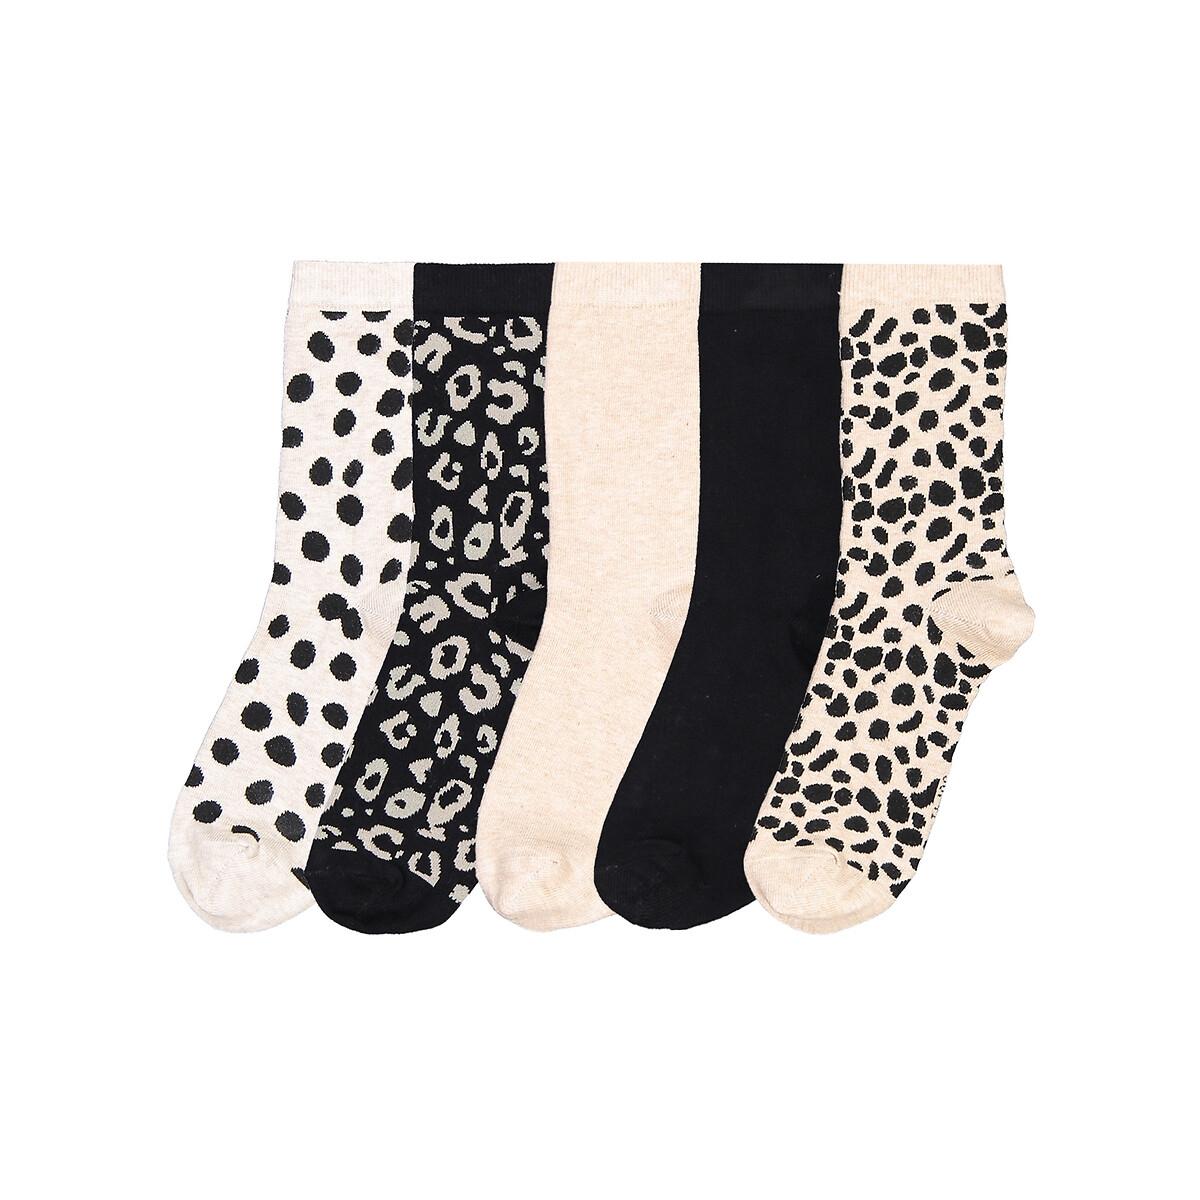 Комплект из 5 пар носков LaRedoute La Redoute 38/41 разноцветный комплект из 3 пар носков laredoute la redoute 35 38 синий